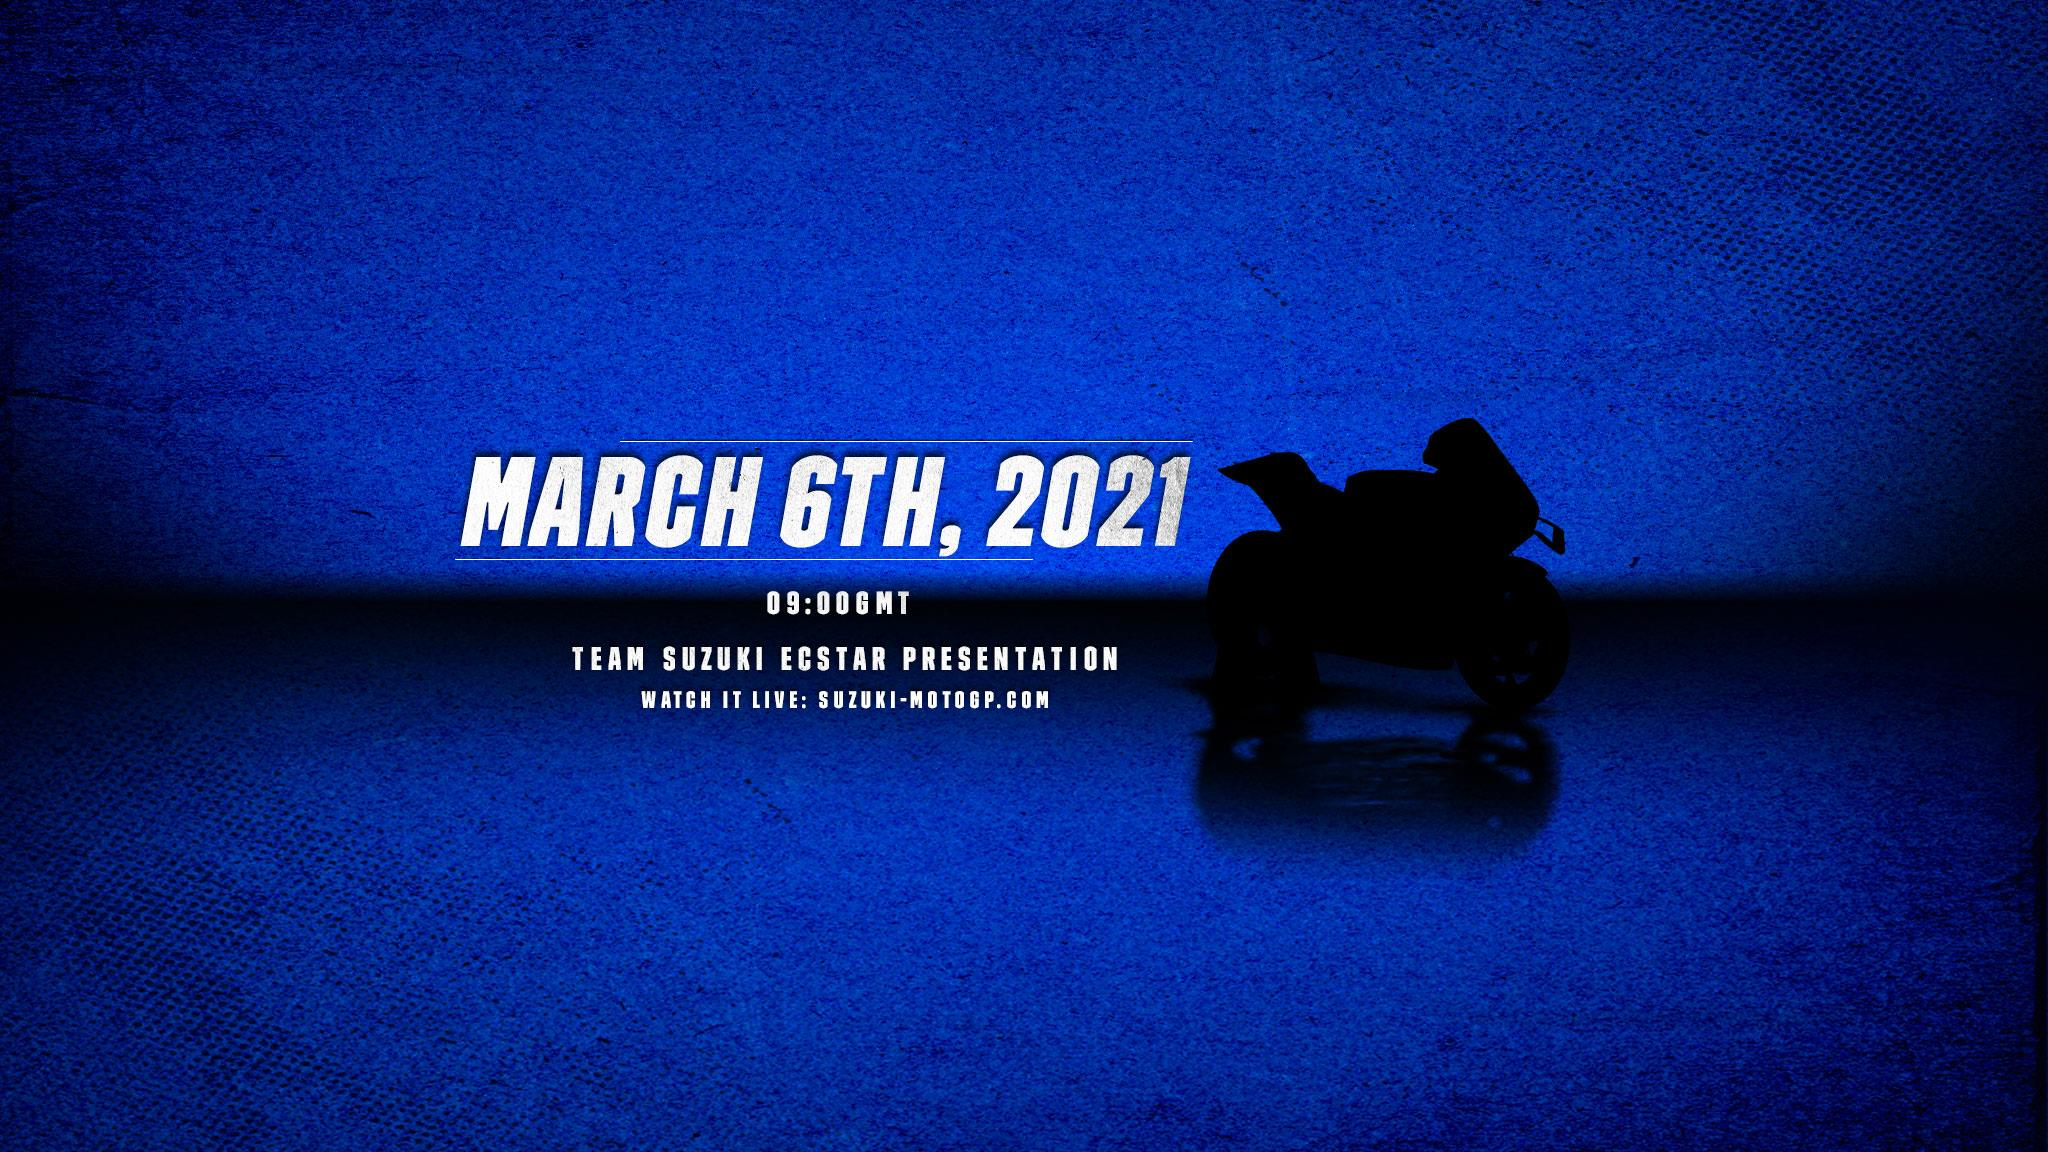 Team SUZUKI ECSTAR(チーム・スズキ・エクスター)3月6日に2021年のチーム体制を発表